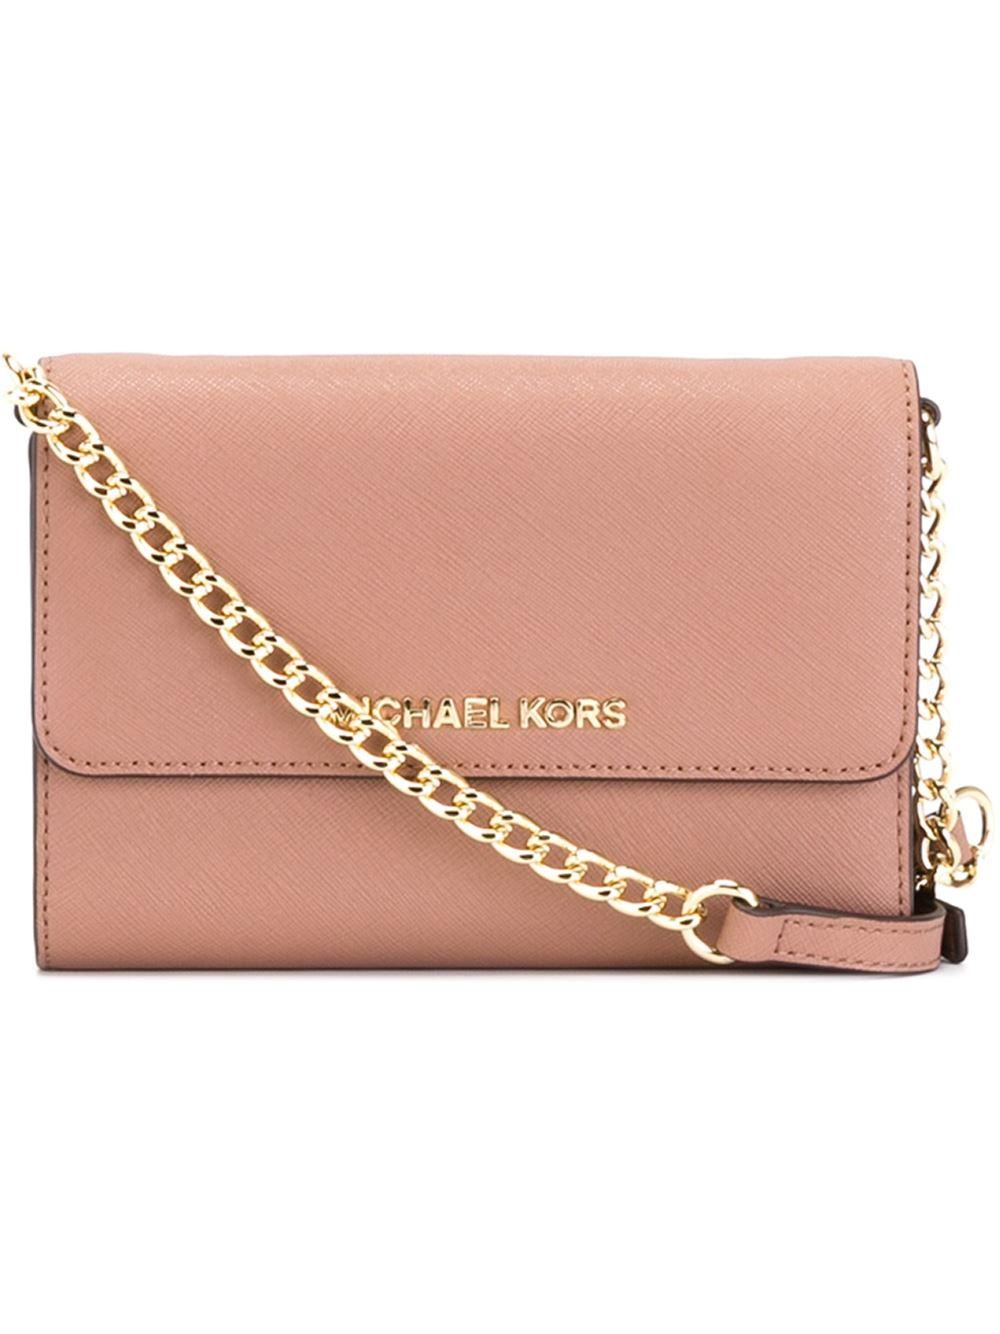 4fd46bada4b6 Lyst - MICHAEL Michael Kors  jet Set Travel  Phone Crossbody Bag in Pink